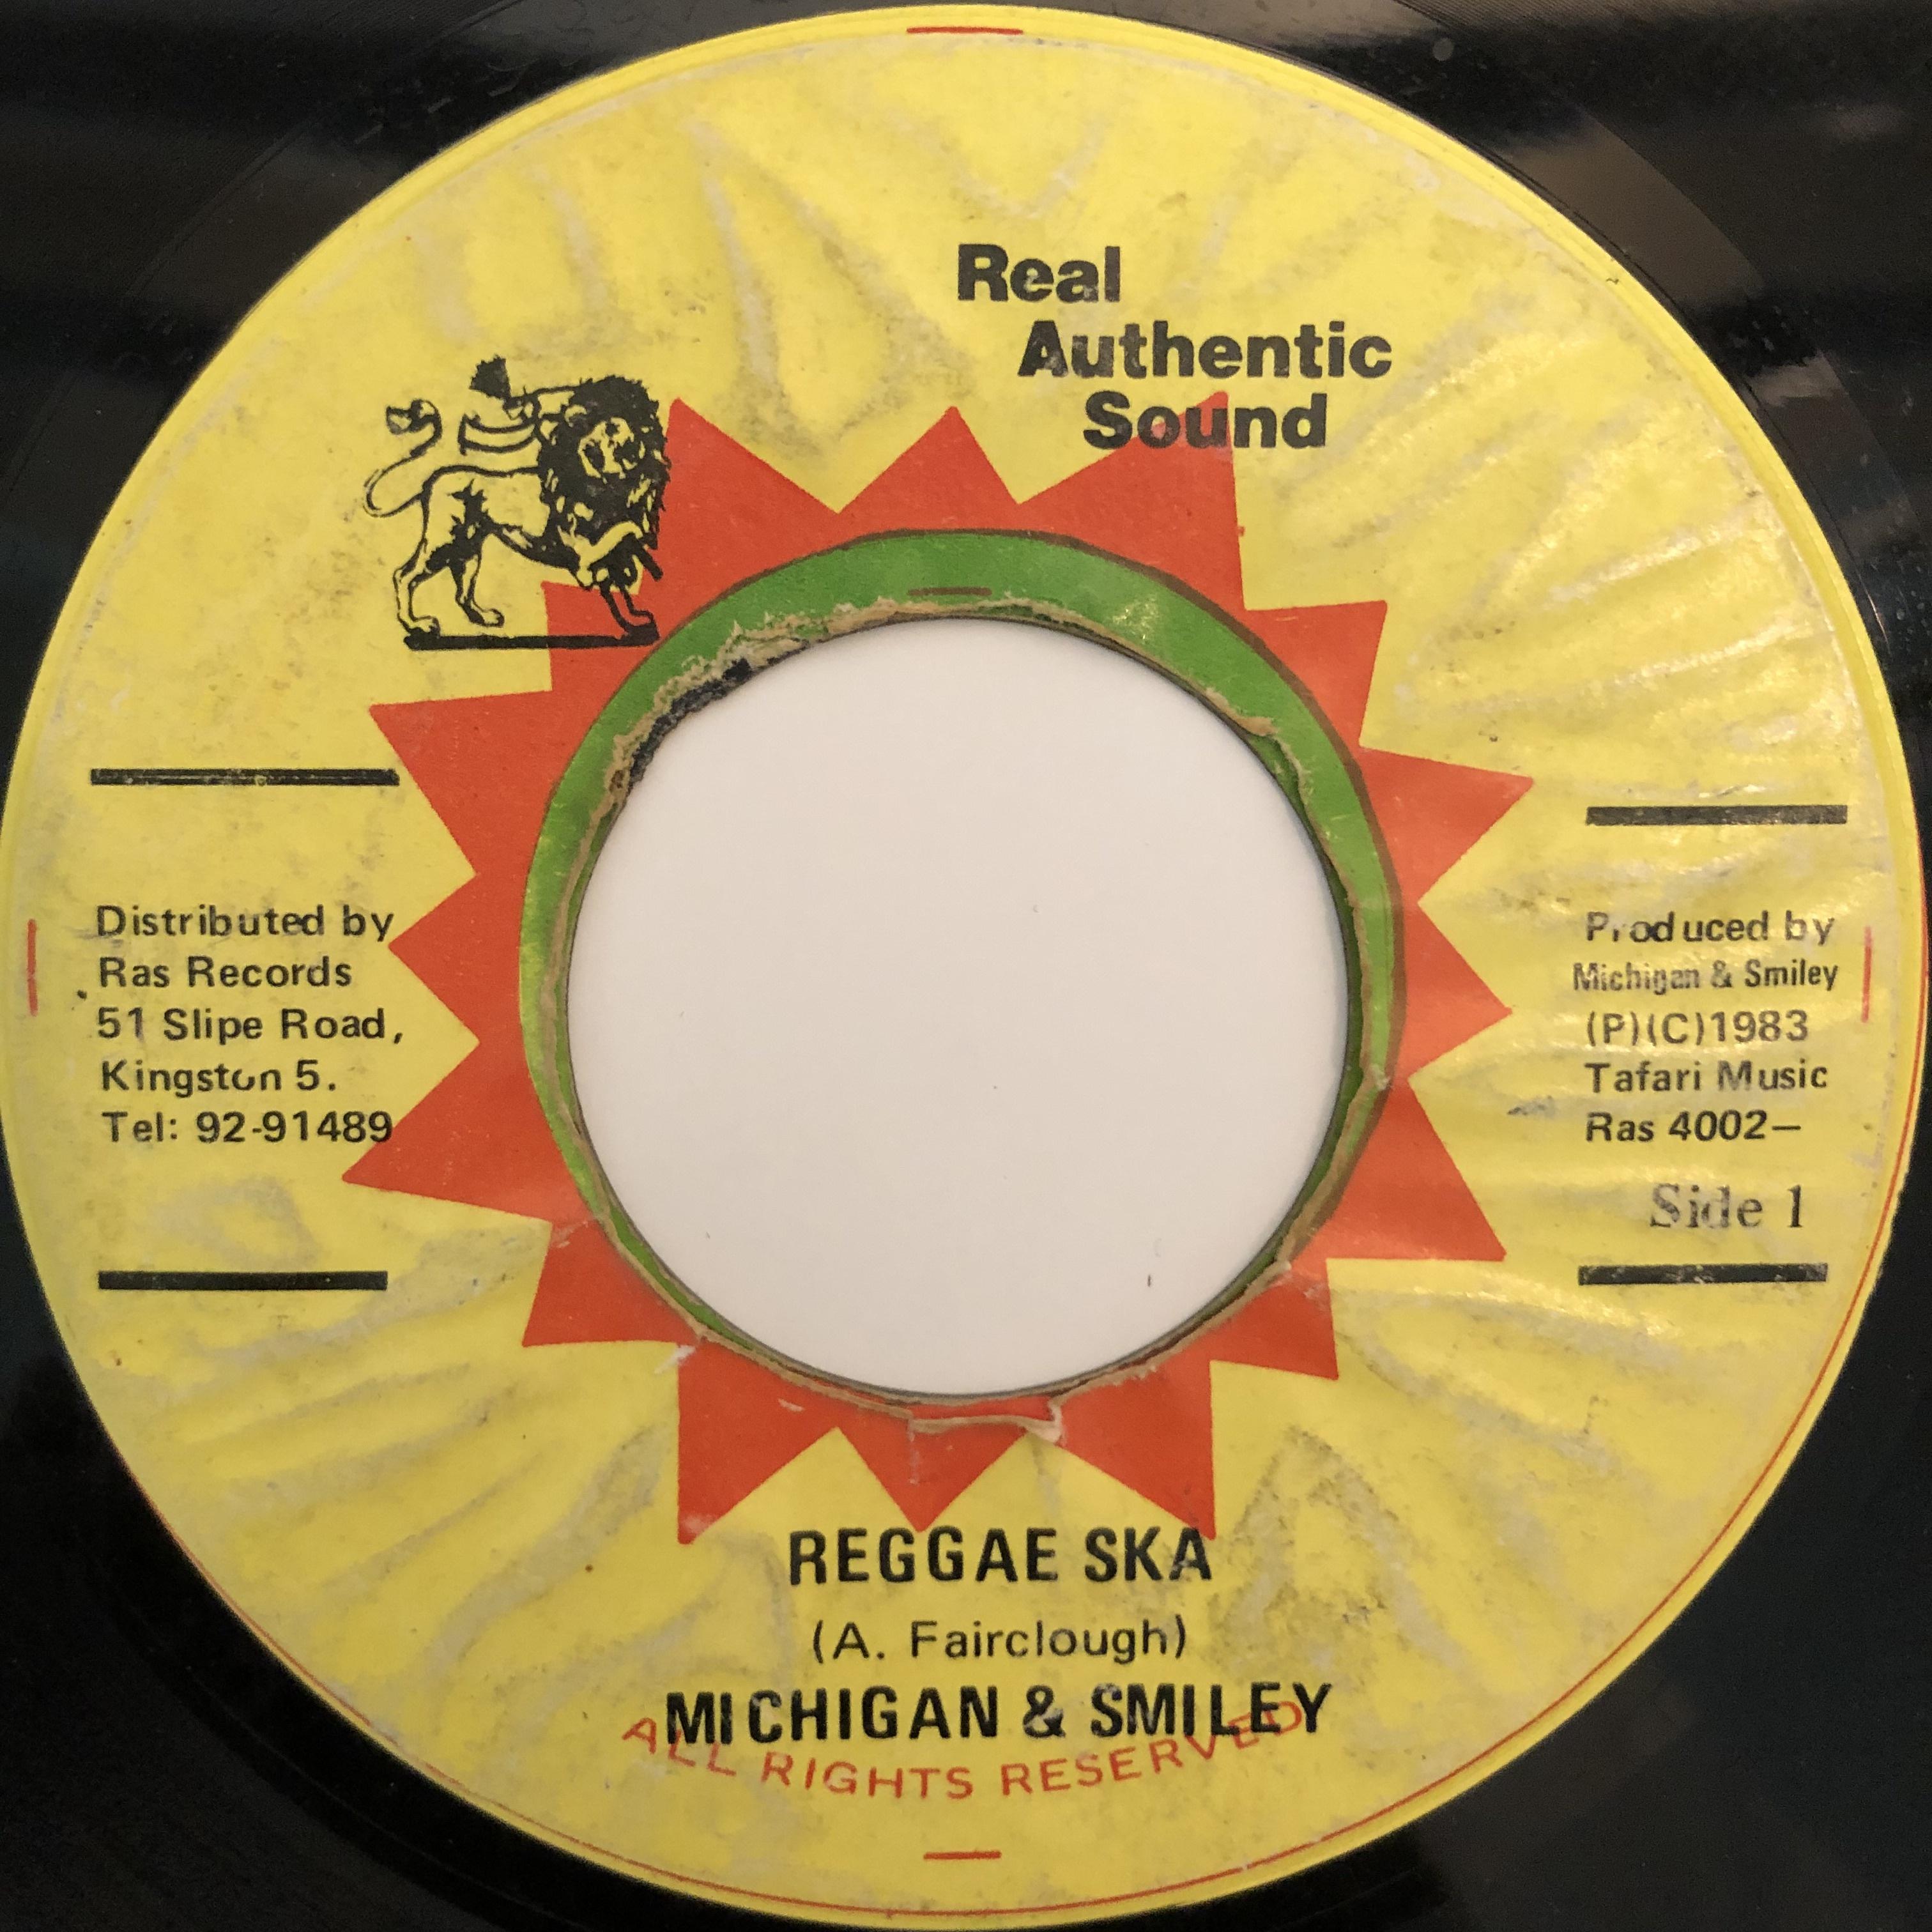 Michigan & Smiley - Reggae Ska【7-20327】